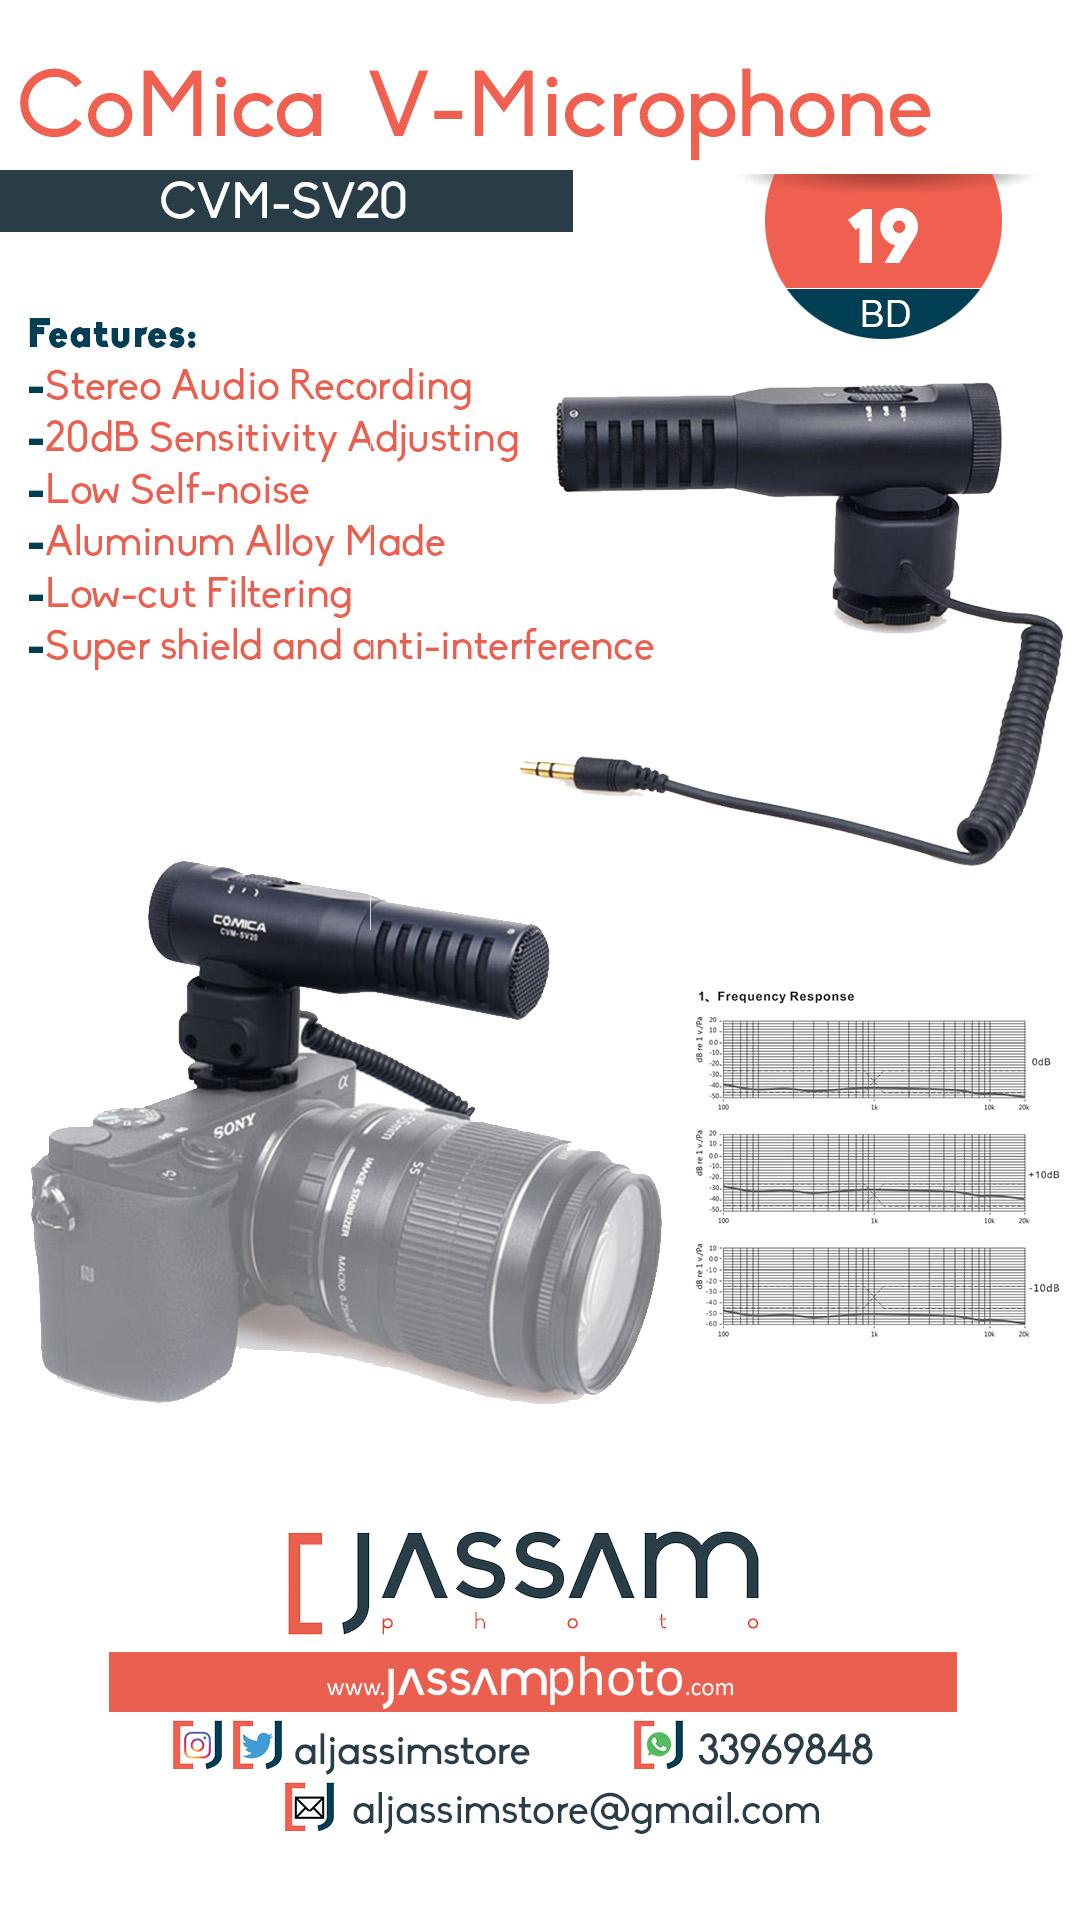 Microphone CVM-SV20